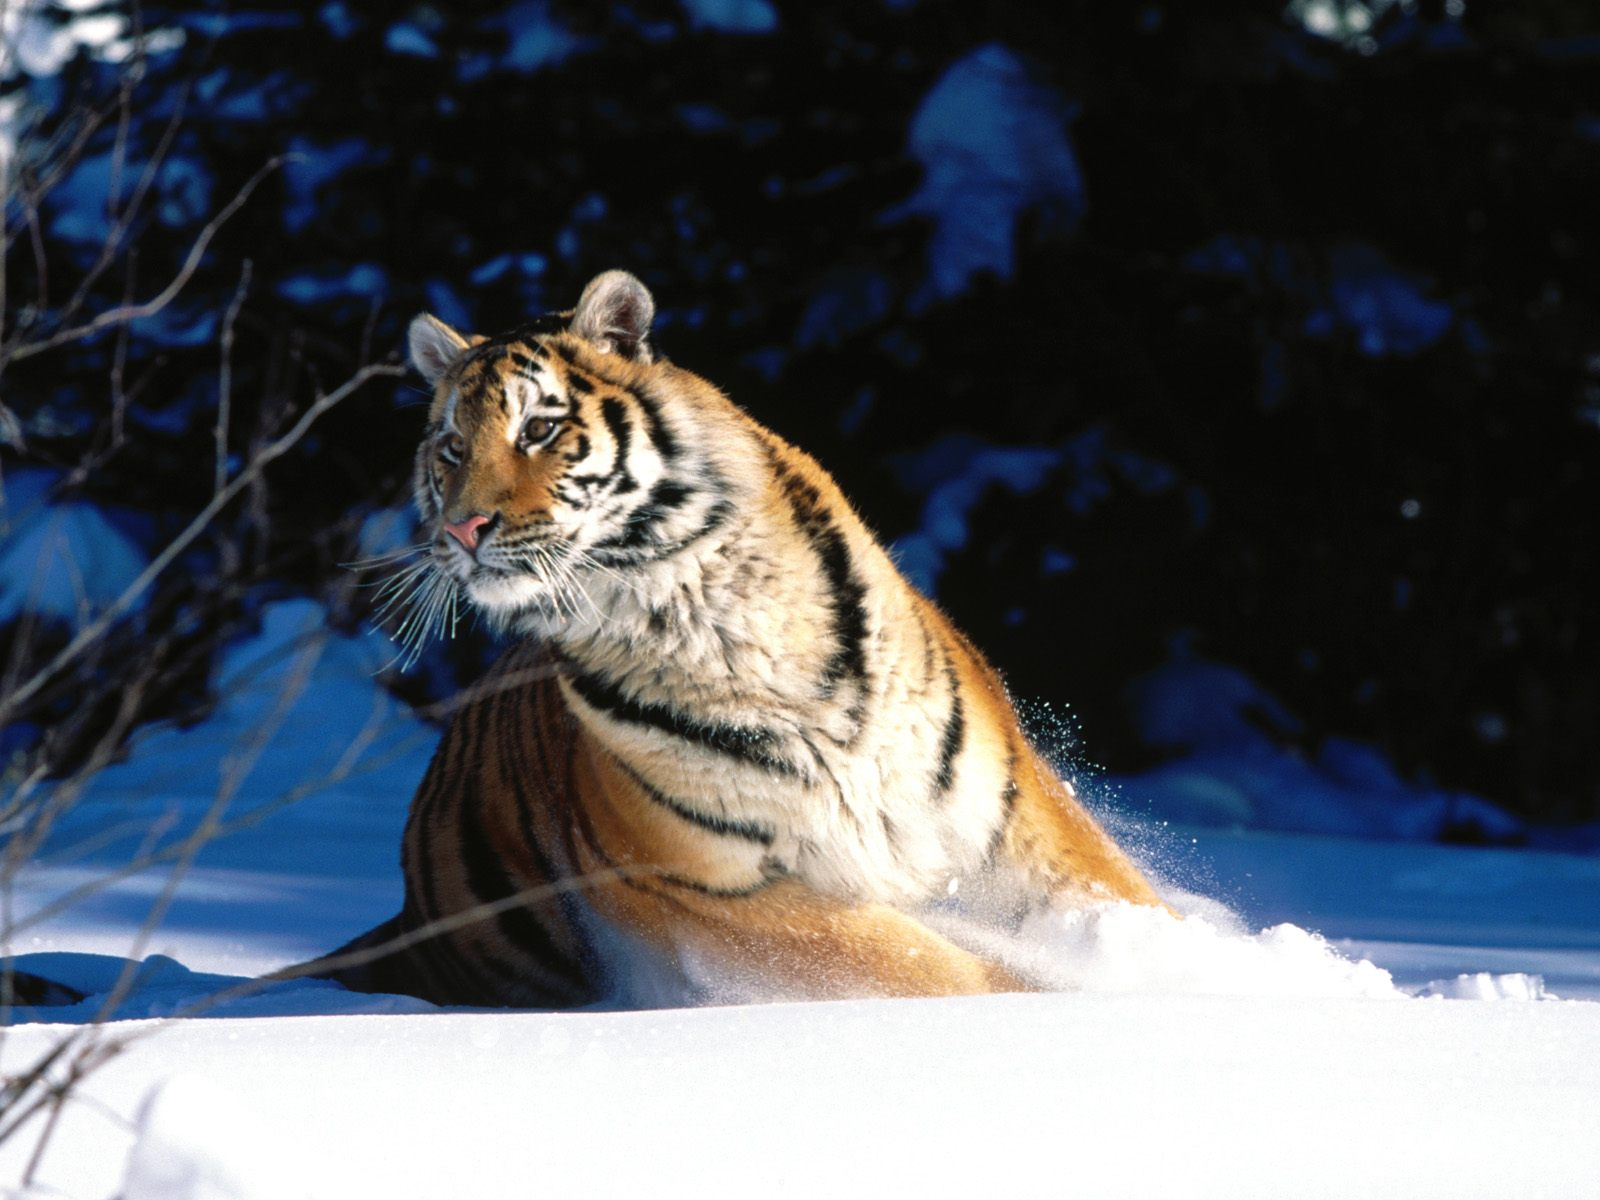 Wintery Scuddle Siberian Tiger